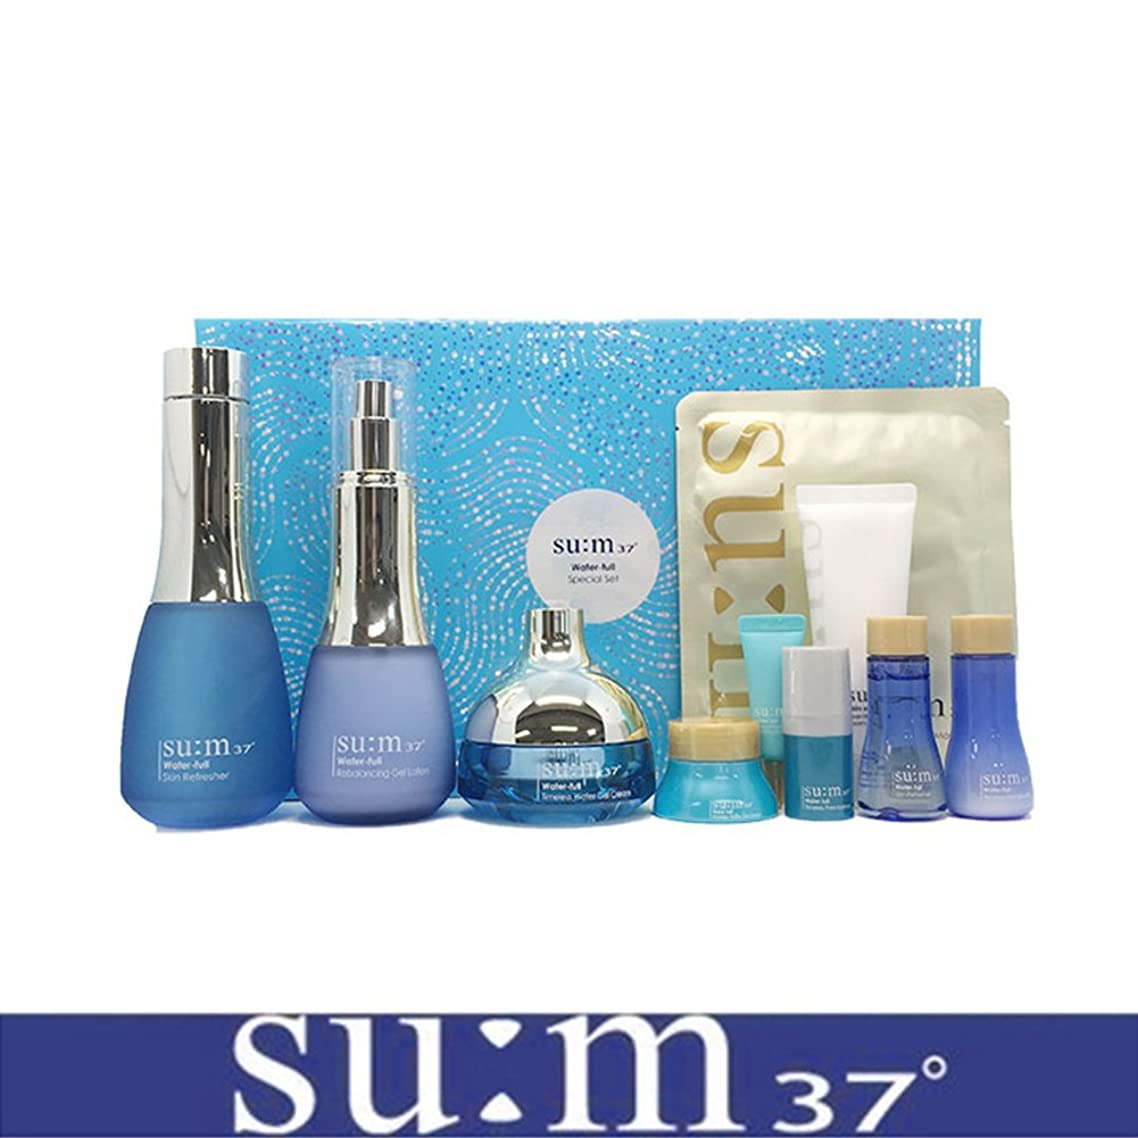 [su:m37/スム37°] SUM37 Water full 3pcs Special Skincare Set/sum37 スム37 ウォーターフル 3種企画セット+[Sample Gift](海外直送品)